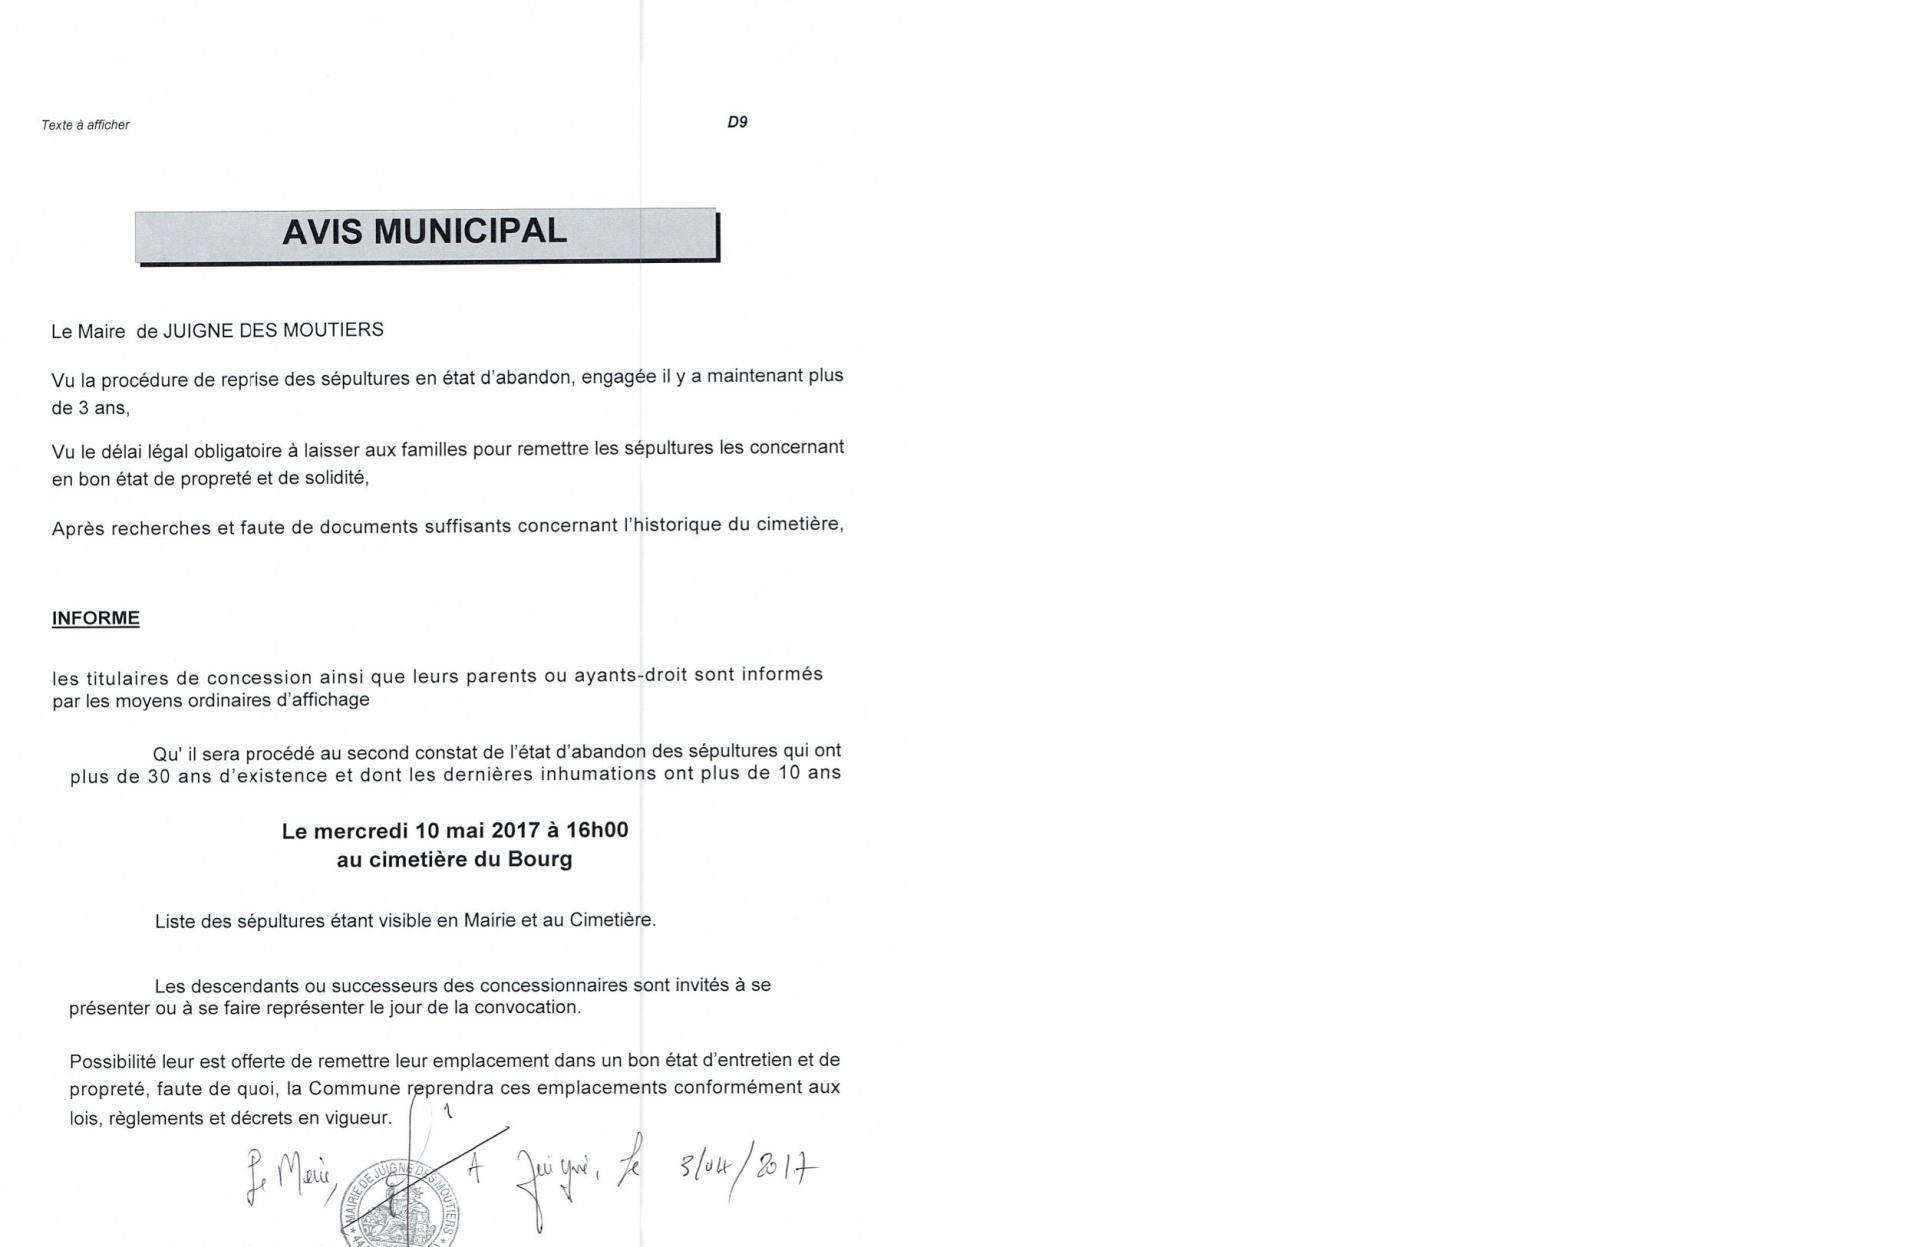 Avis municipal